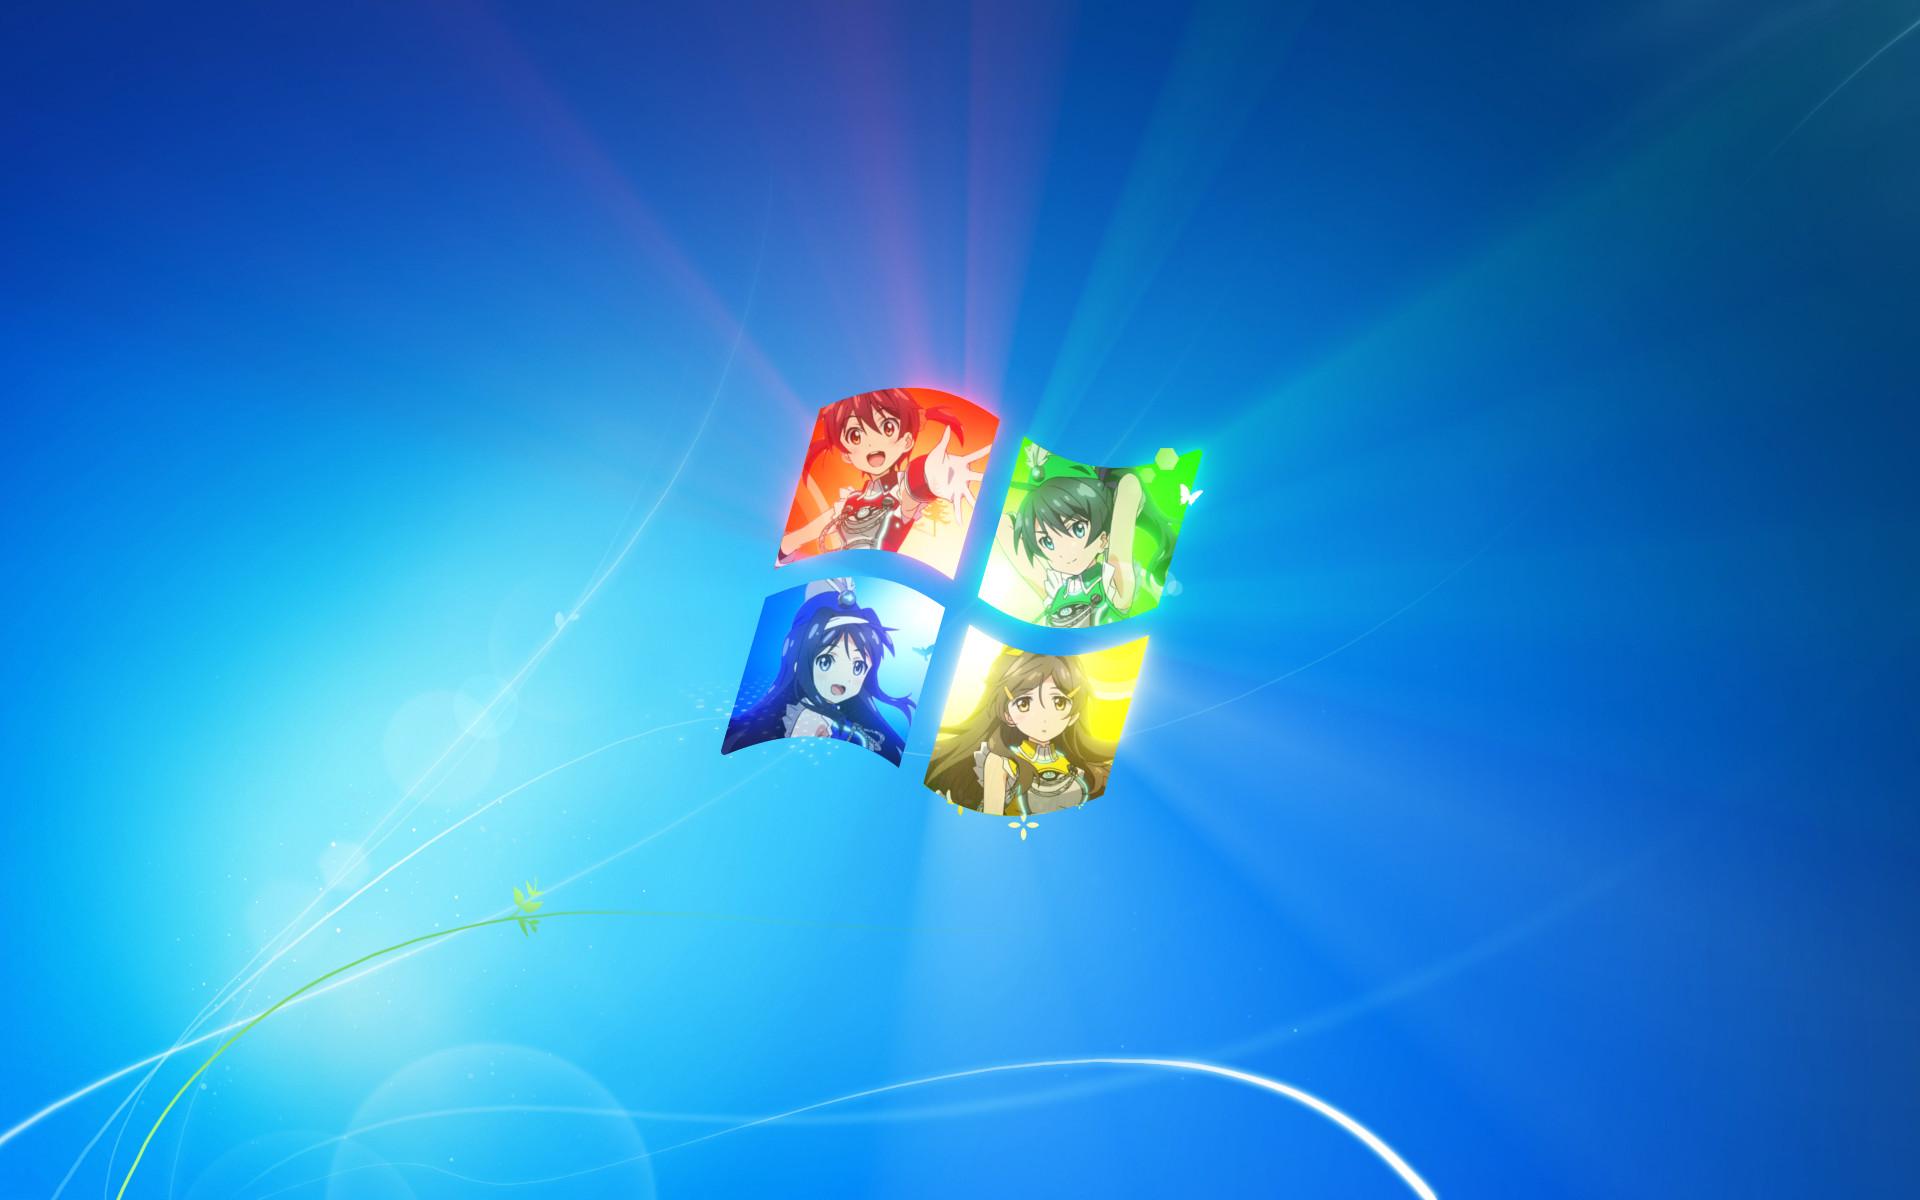 1920x1200, Vividred Operation Windows 7 Wallpaper By - Desktop Windows 7 Anime - HD Wallpaper